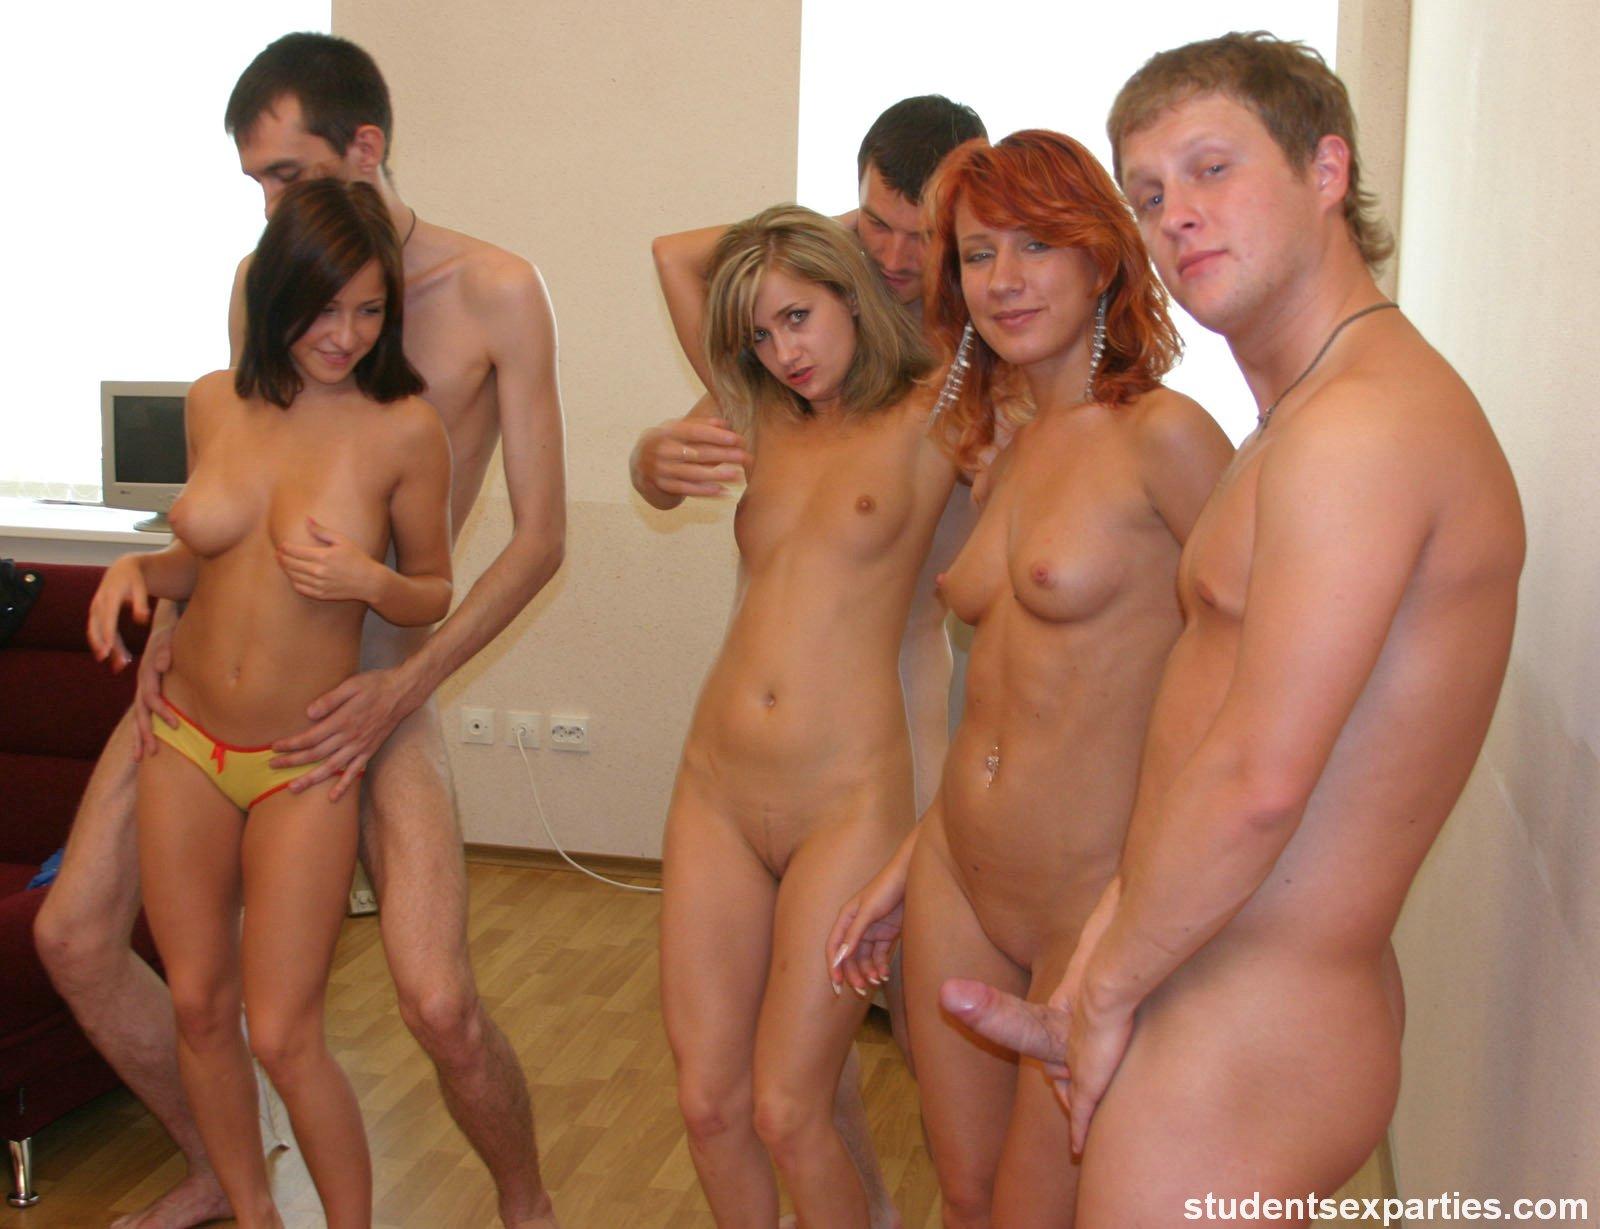 Gorące nastolatki nago